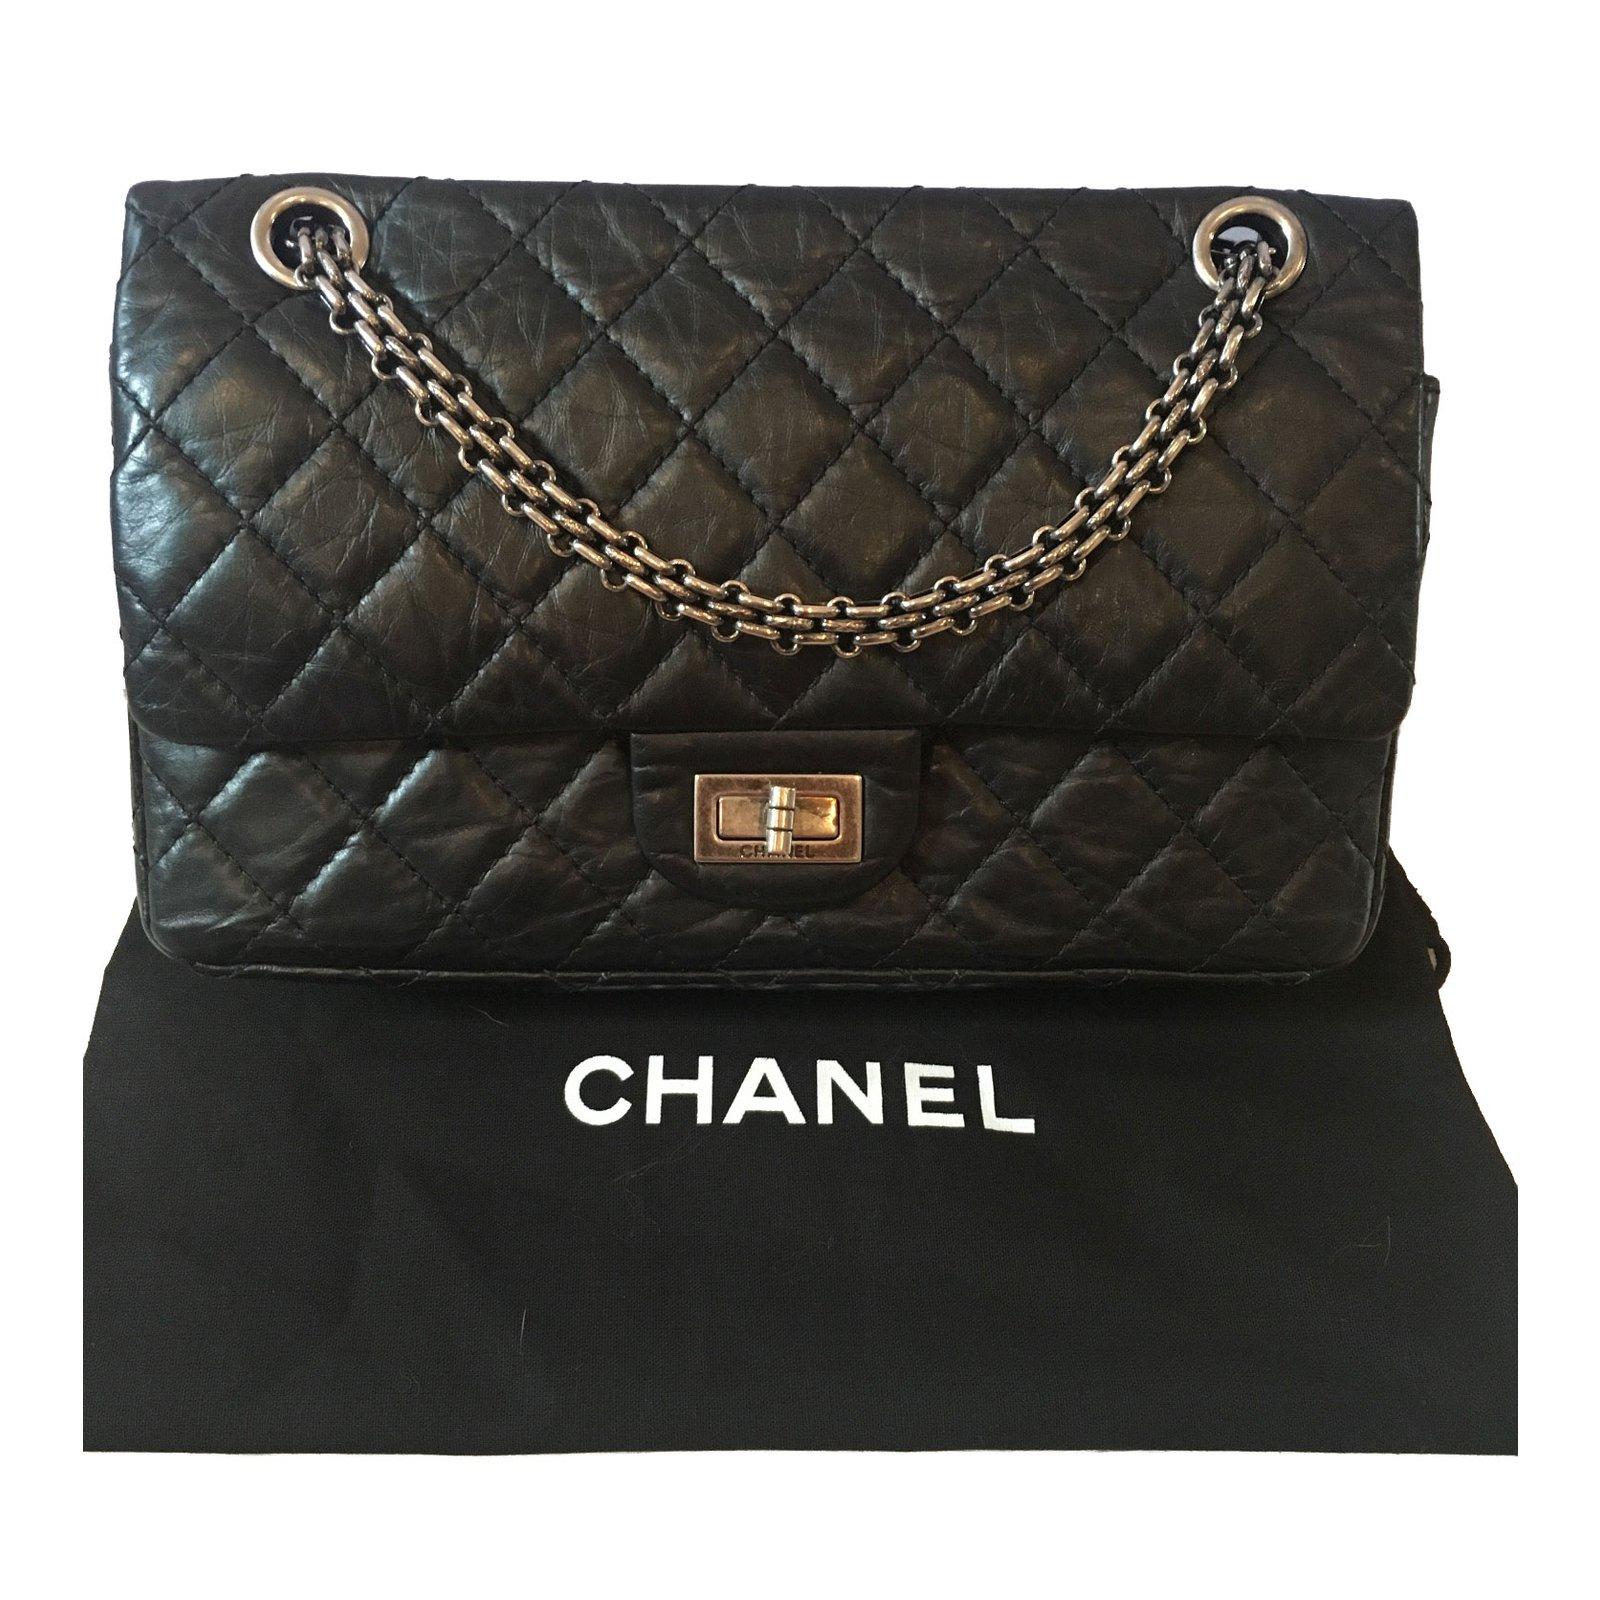 9f34f6086739 Chanel 2.55 Handbags Leather Black ref.71073 - Joli Closet